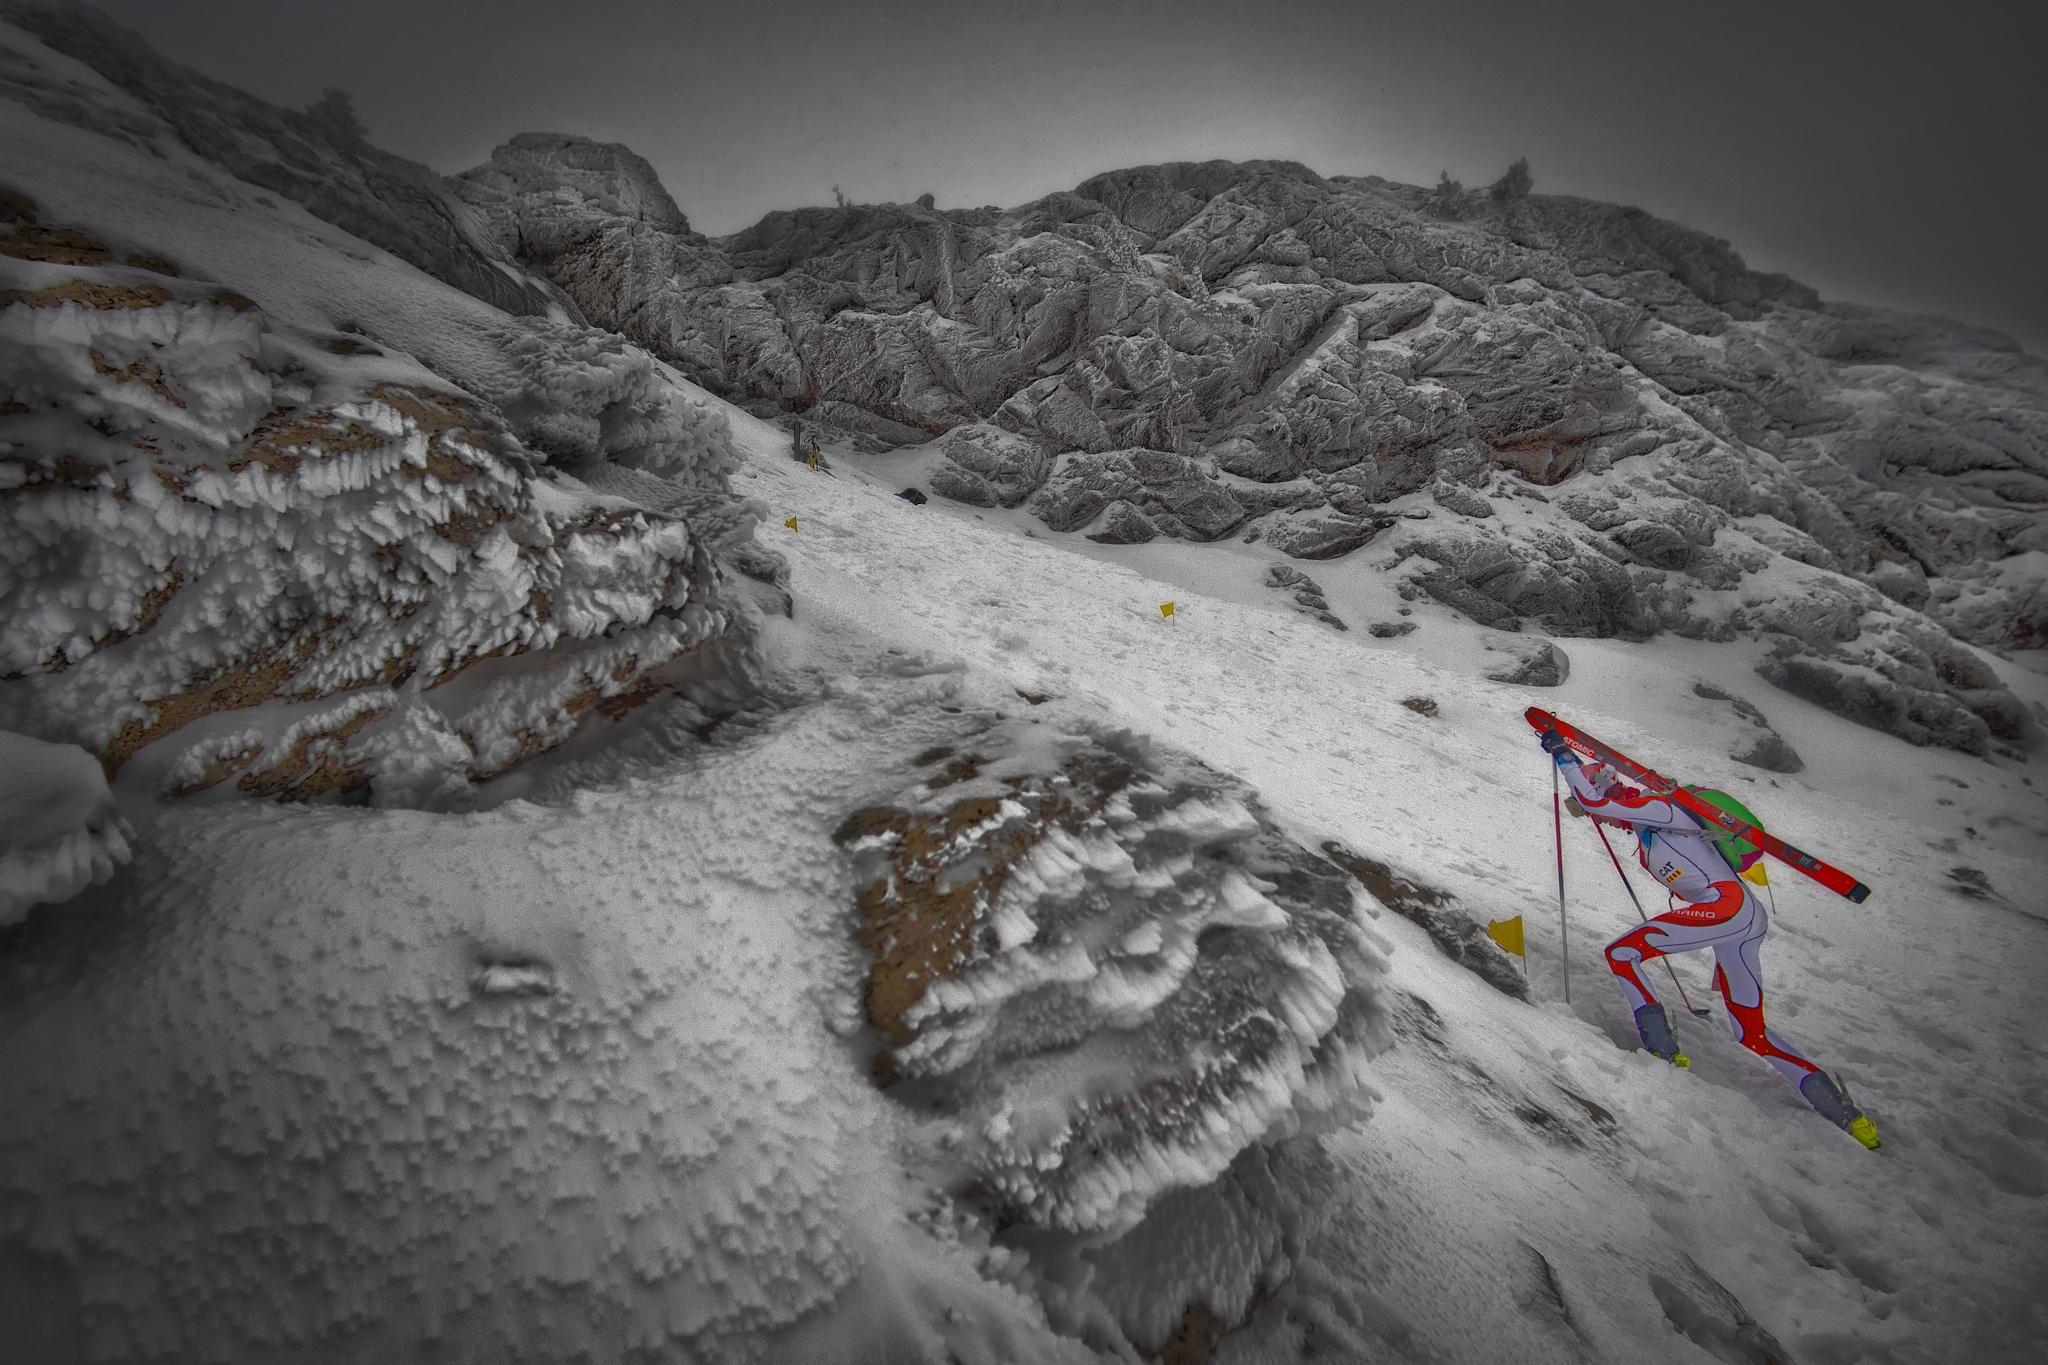 Causiat Extreme 2017 - Ski & Snowboard - Fotos del Valle del Aragón, Mikel Besga